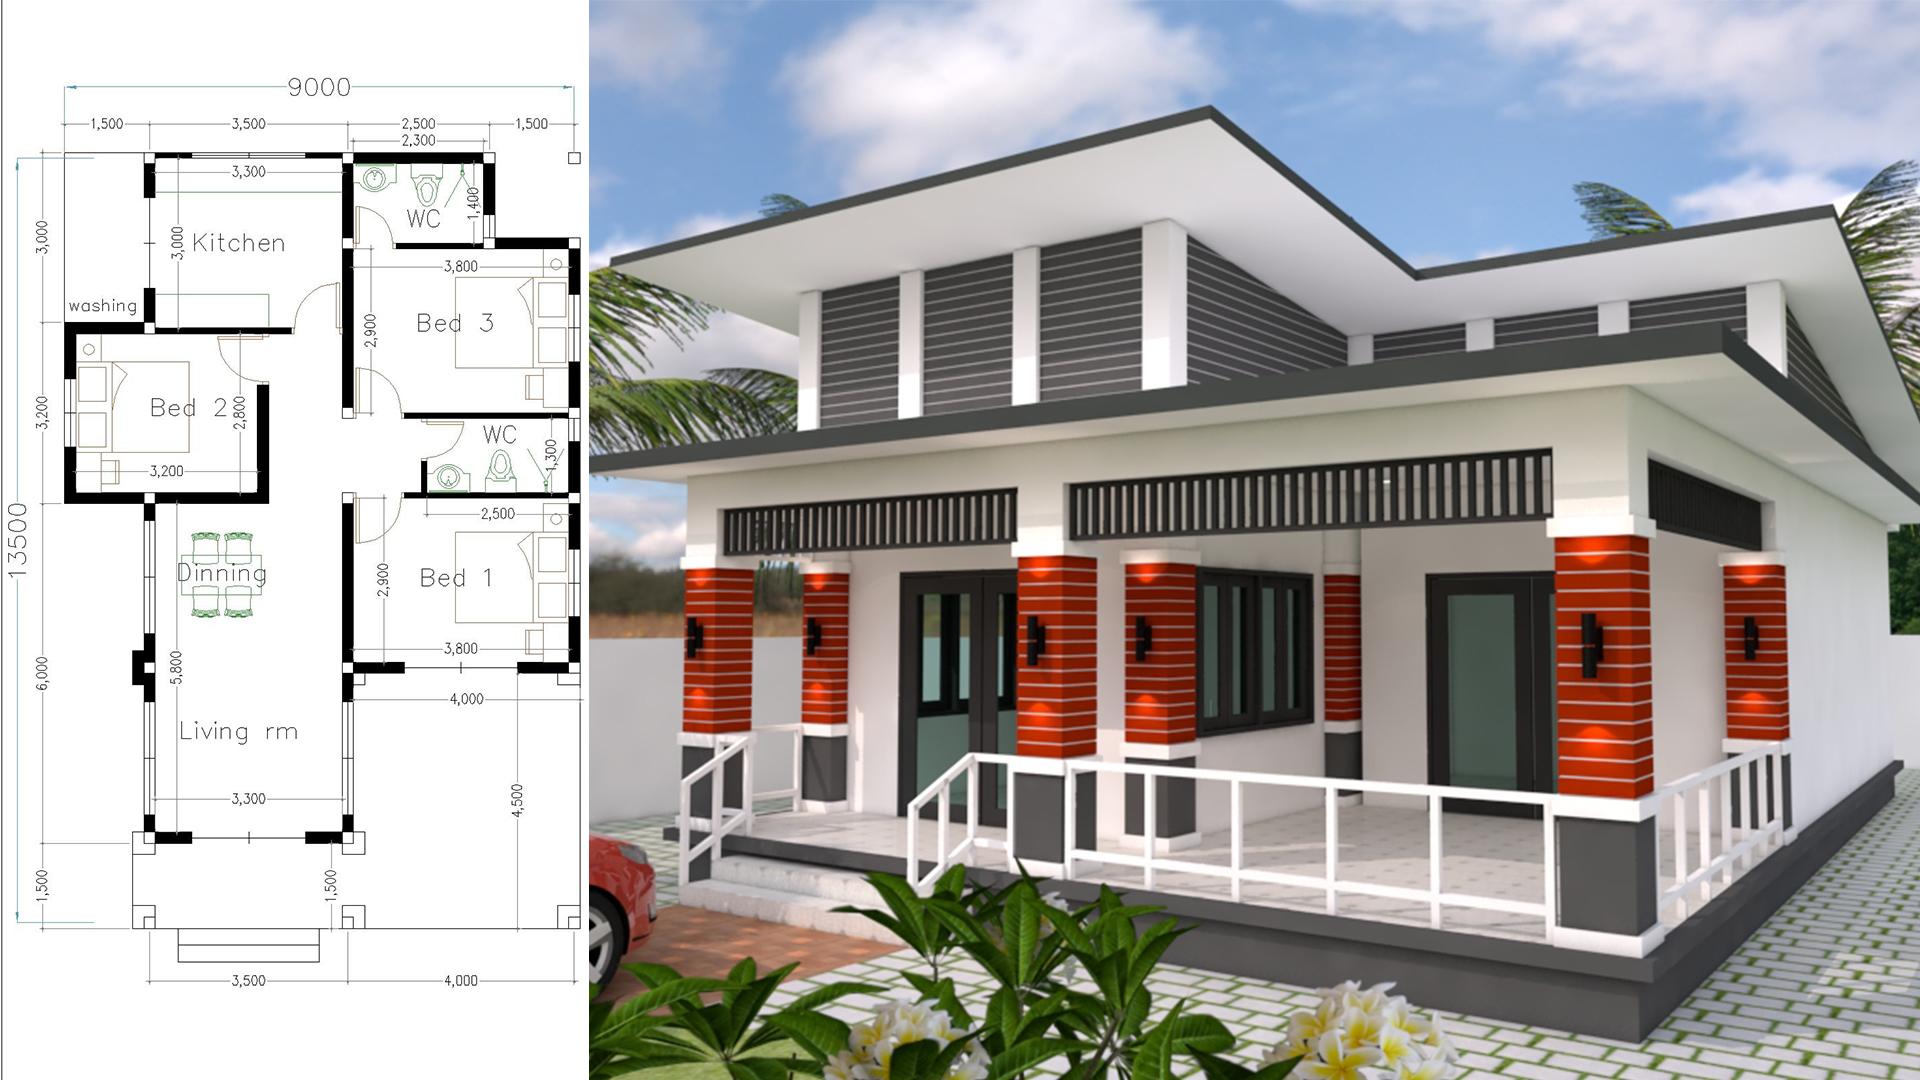 Bungalow House Design 9x13.5 Meter With 3 Bedrooms - SamPhoas Plan